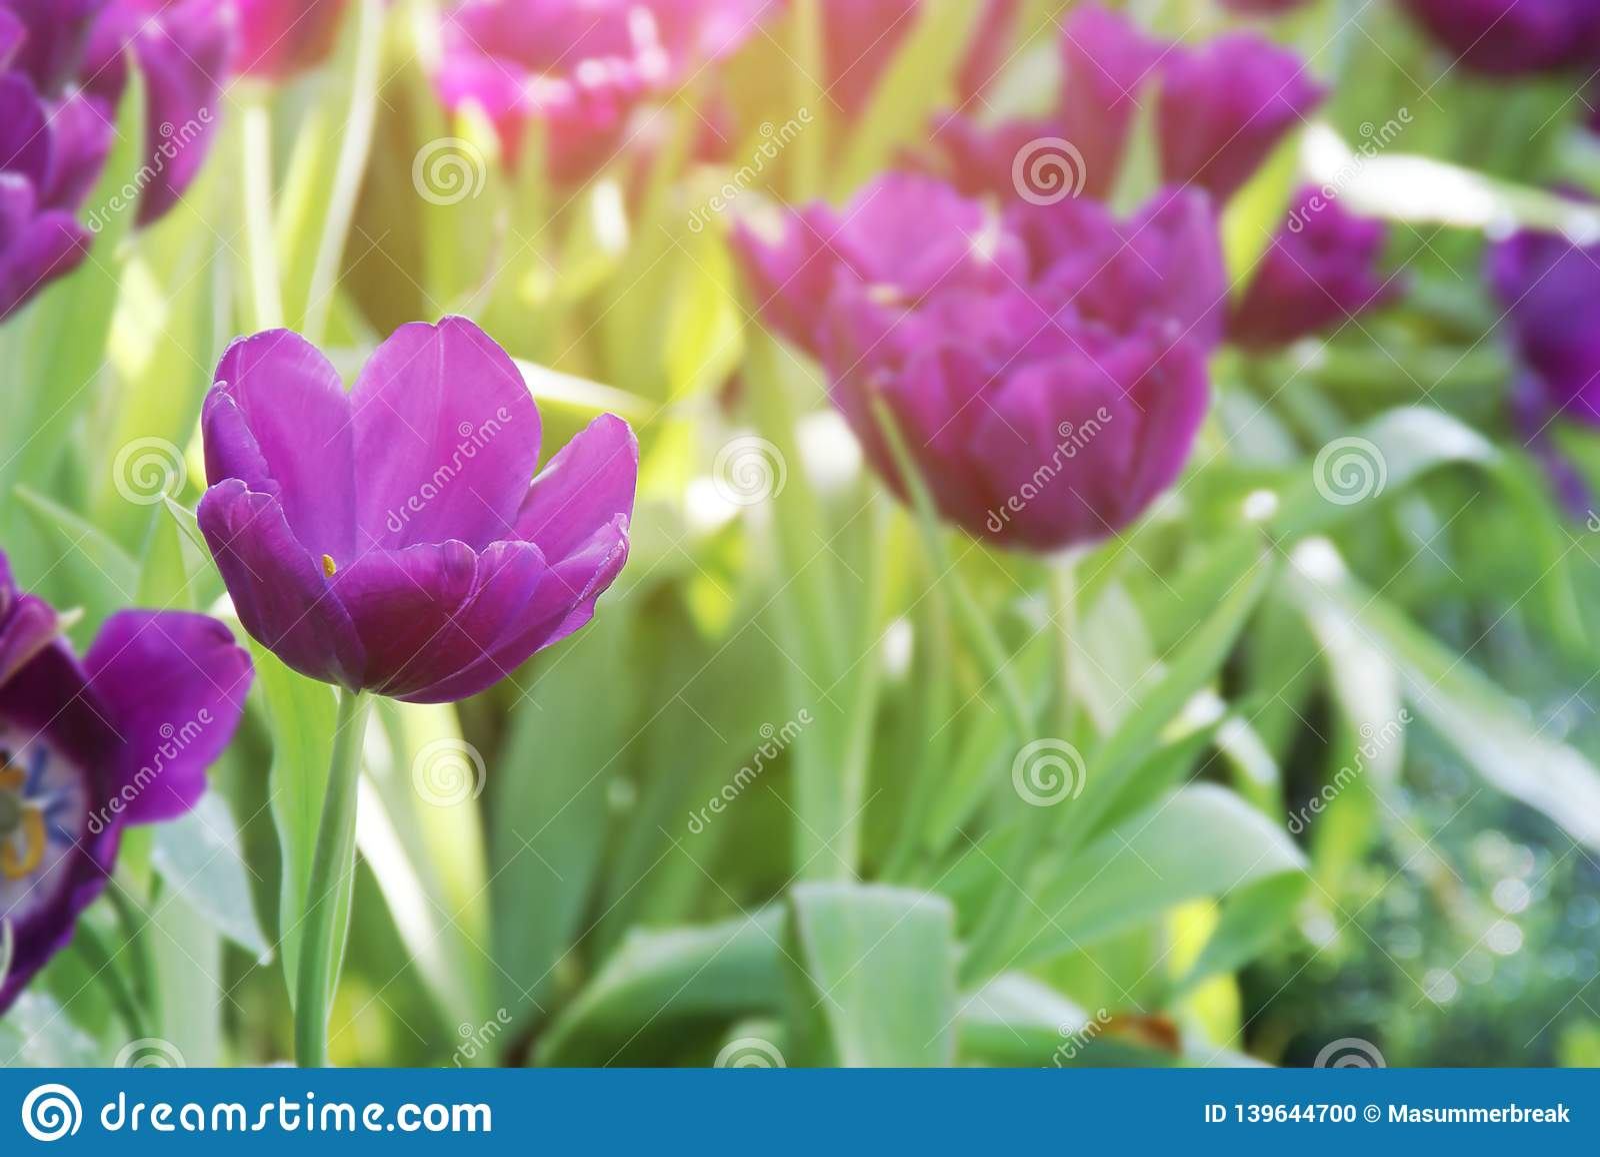 Purple Tulip Flowers in the Garden